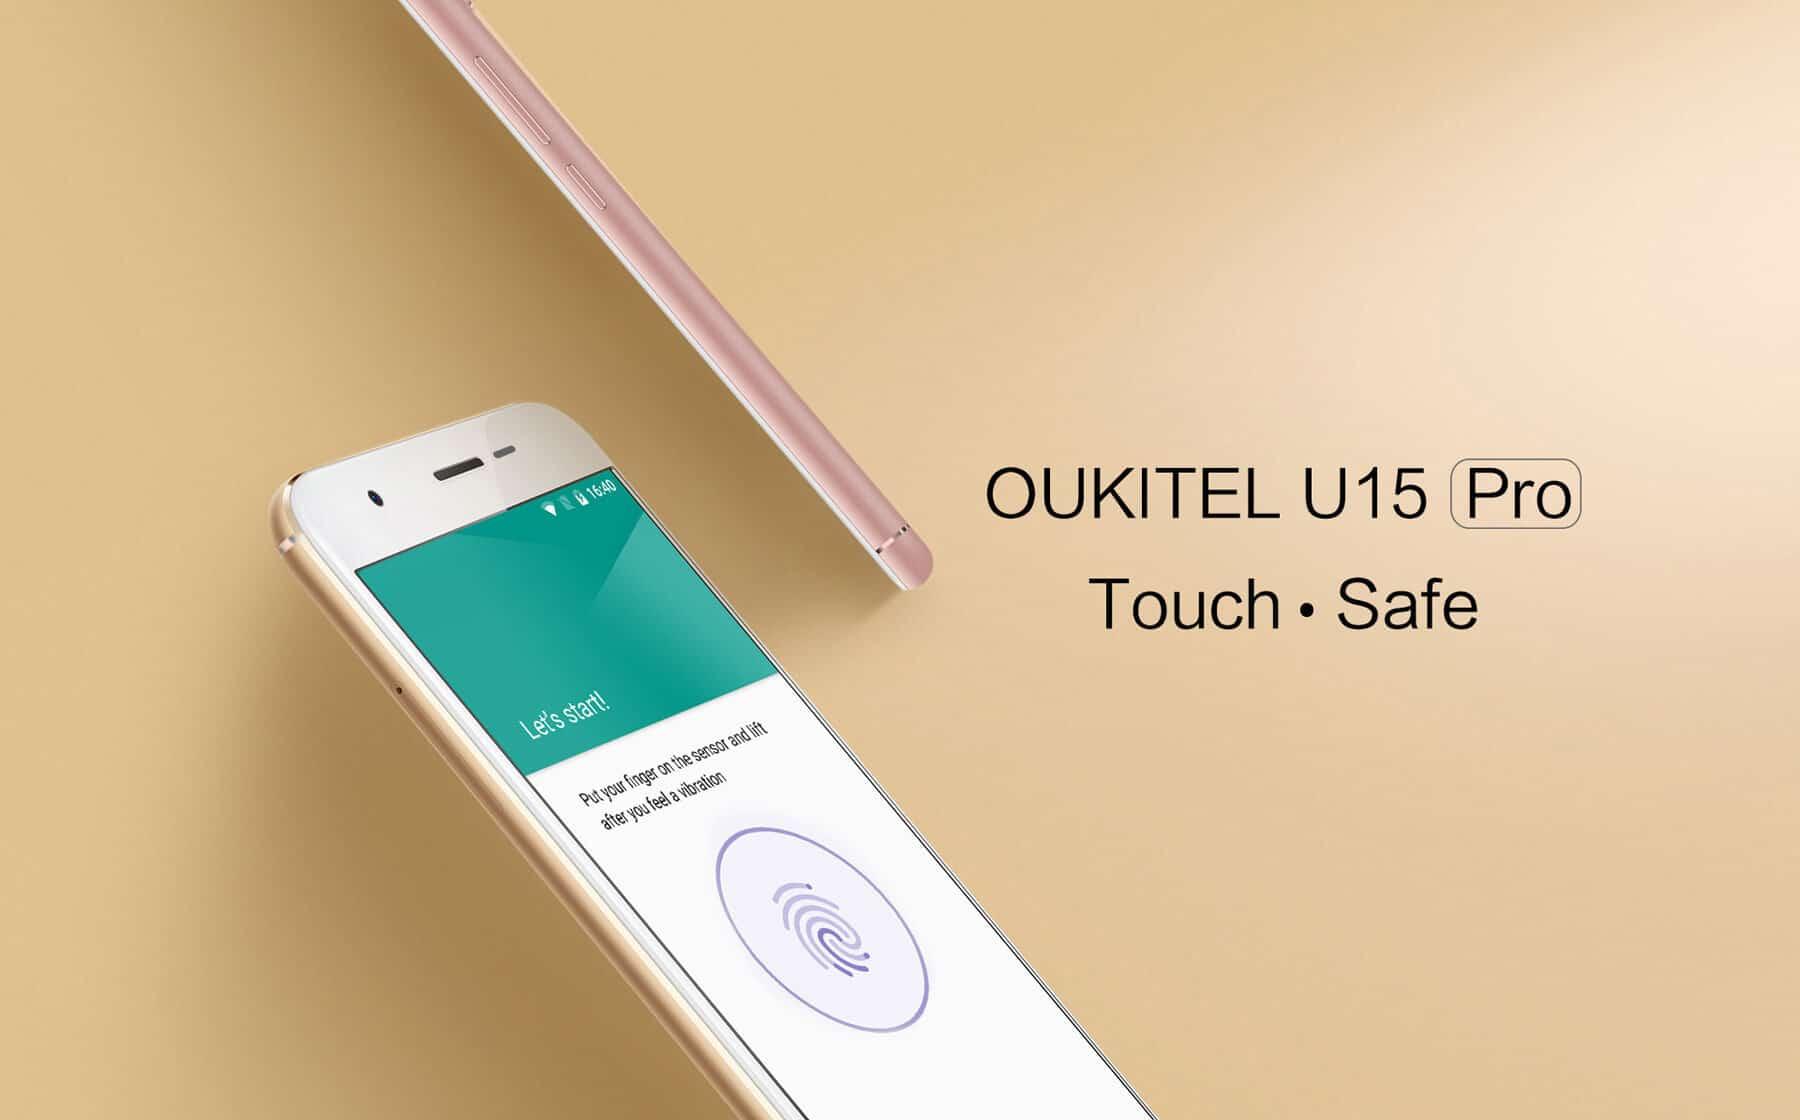 Oukitel U15 Pro 4G Phablet flash sale